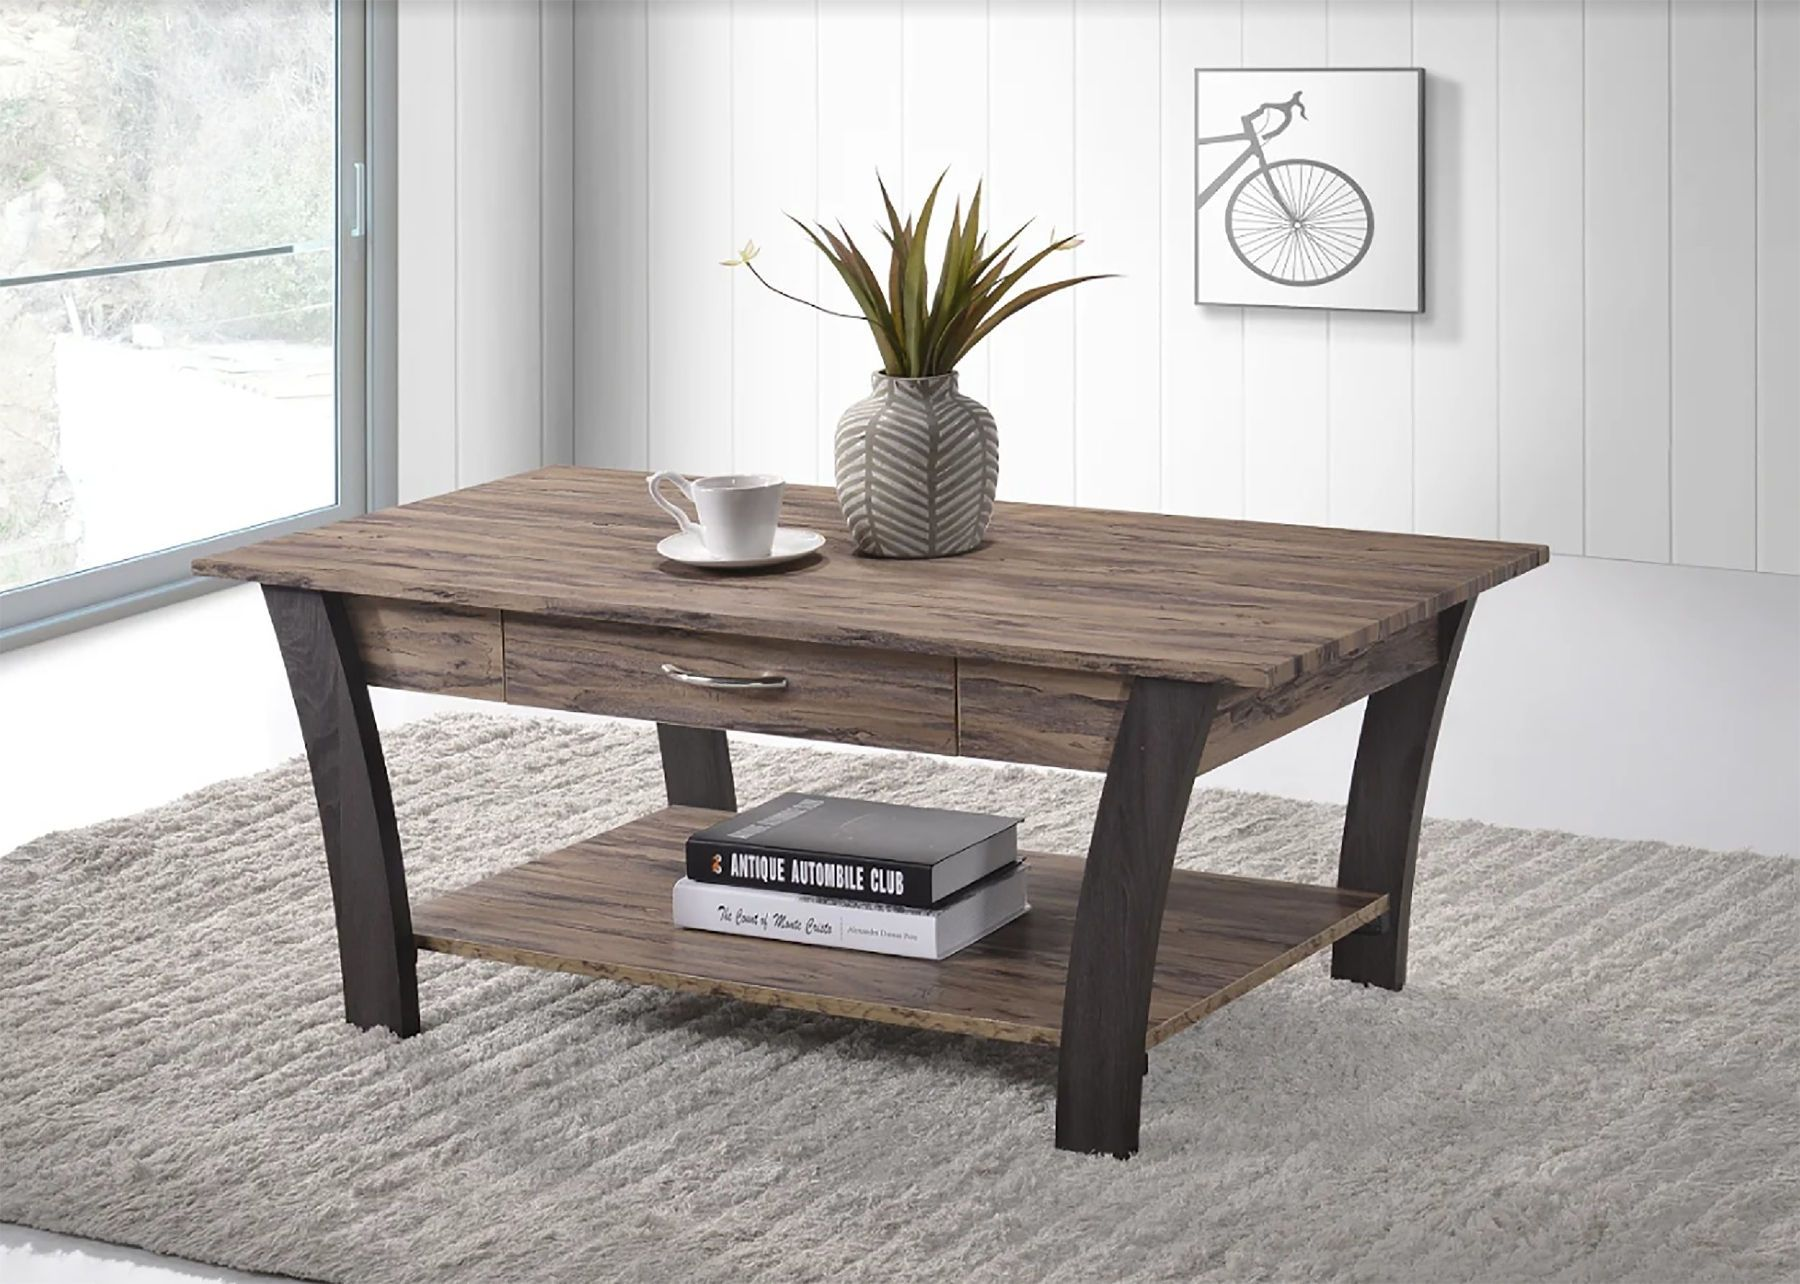 Zag Coffee Table Ct300 Casamode Furniture Coffee Tables Coffee Table With Storage Coffee Table Brown Coffee Table [ 1284 x 1800 Pixel ]